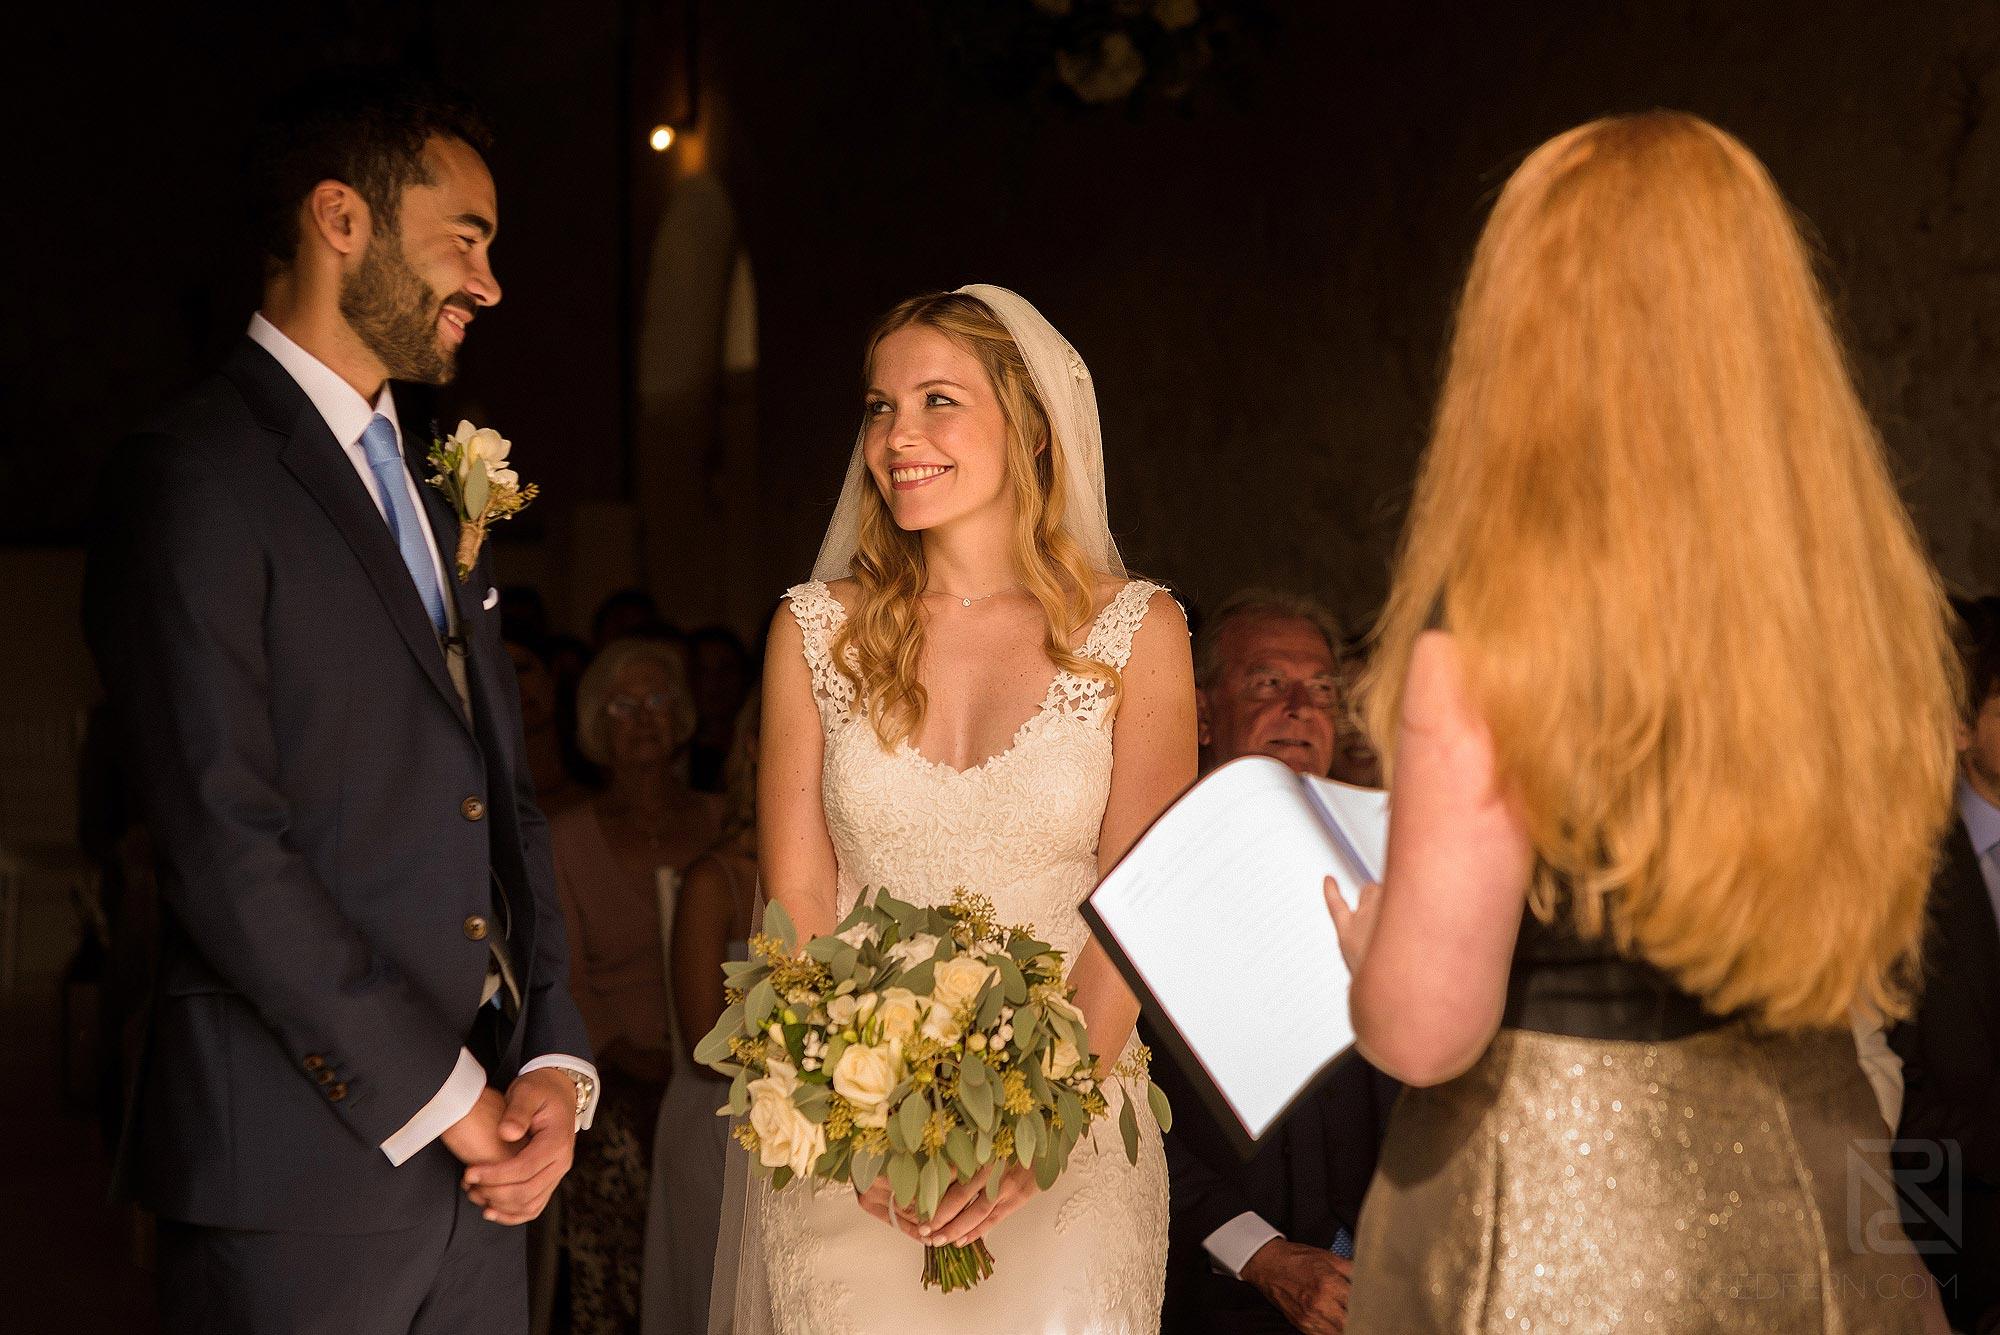 happy moment between bride and groom during wedding ceremony